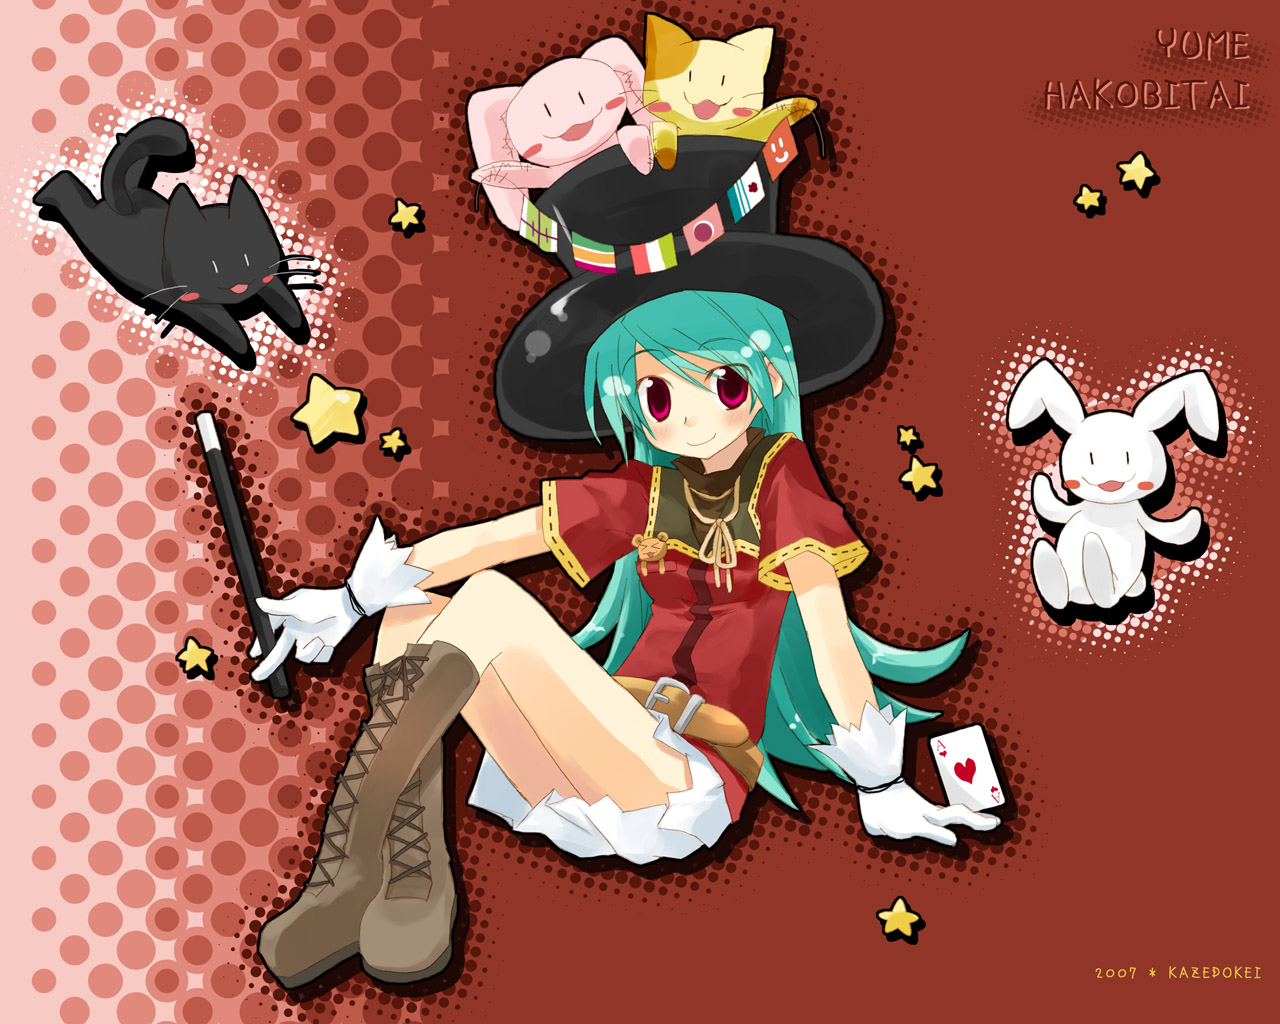 animal blue_hair blush boots cat fugetsu_aoi gloves hat long_hair original red_eyes ribbons teddy_bear